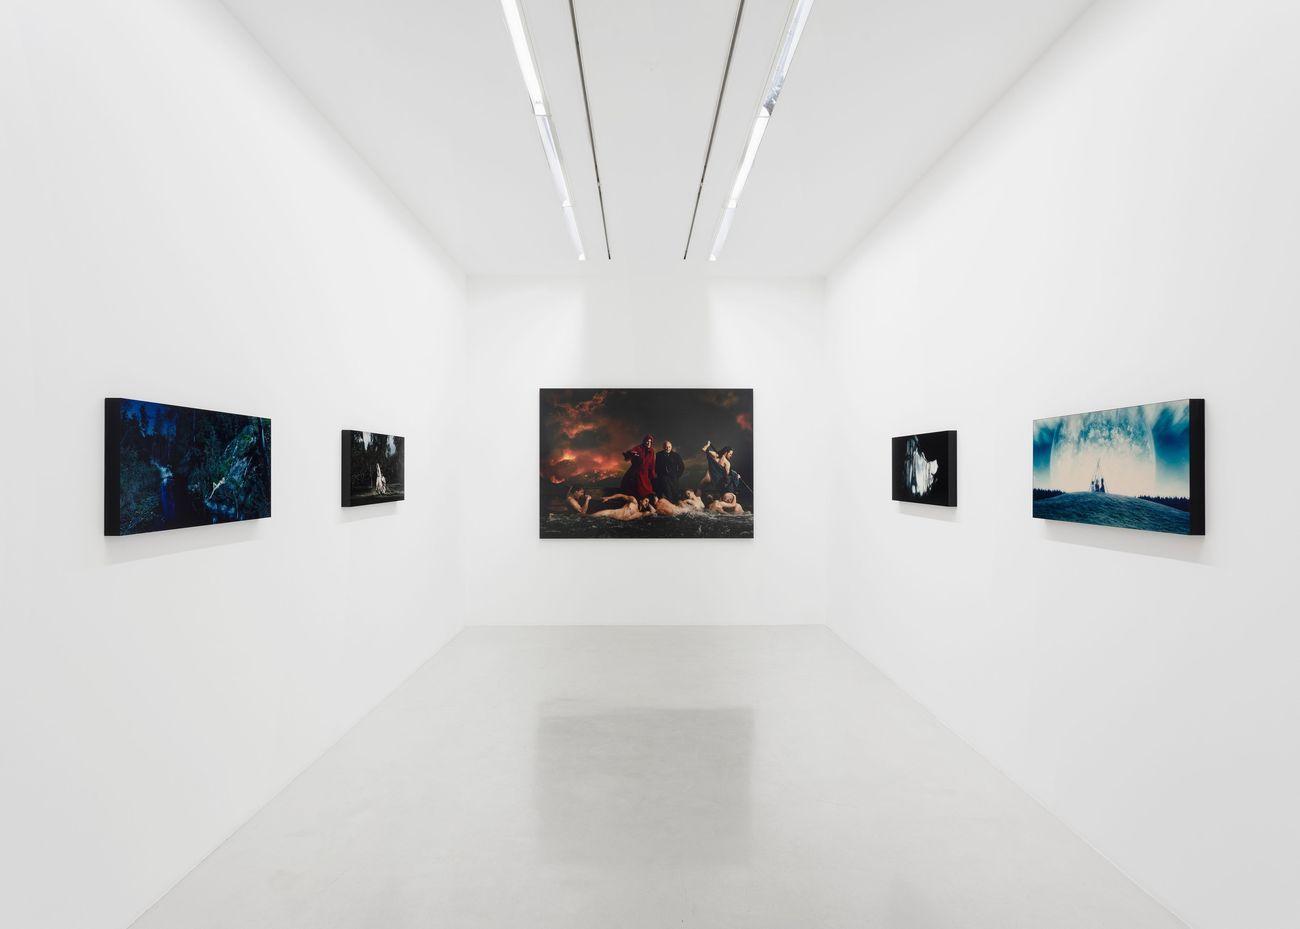 Lars von Trier. Exhibition view at Perrotin, Parigi 2021